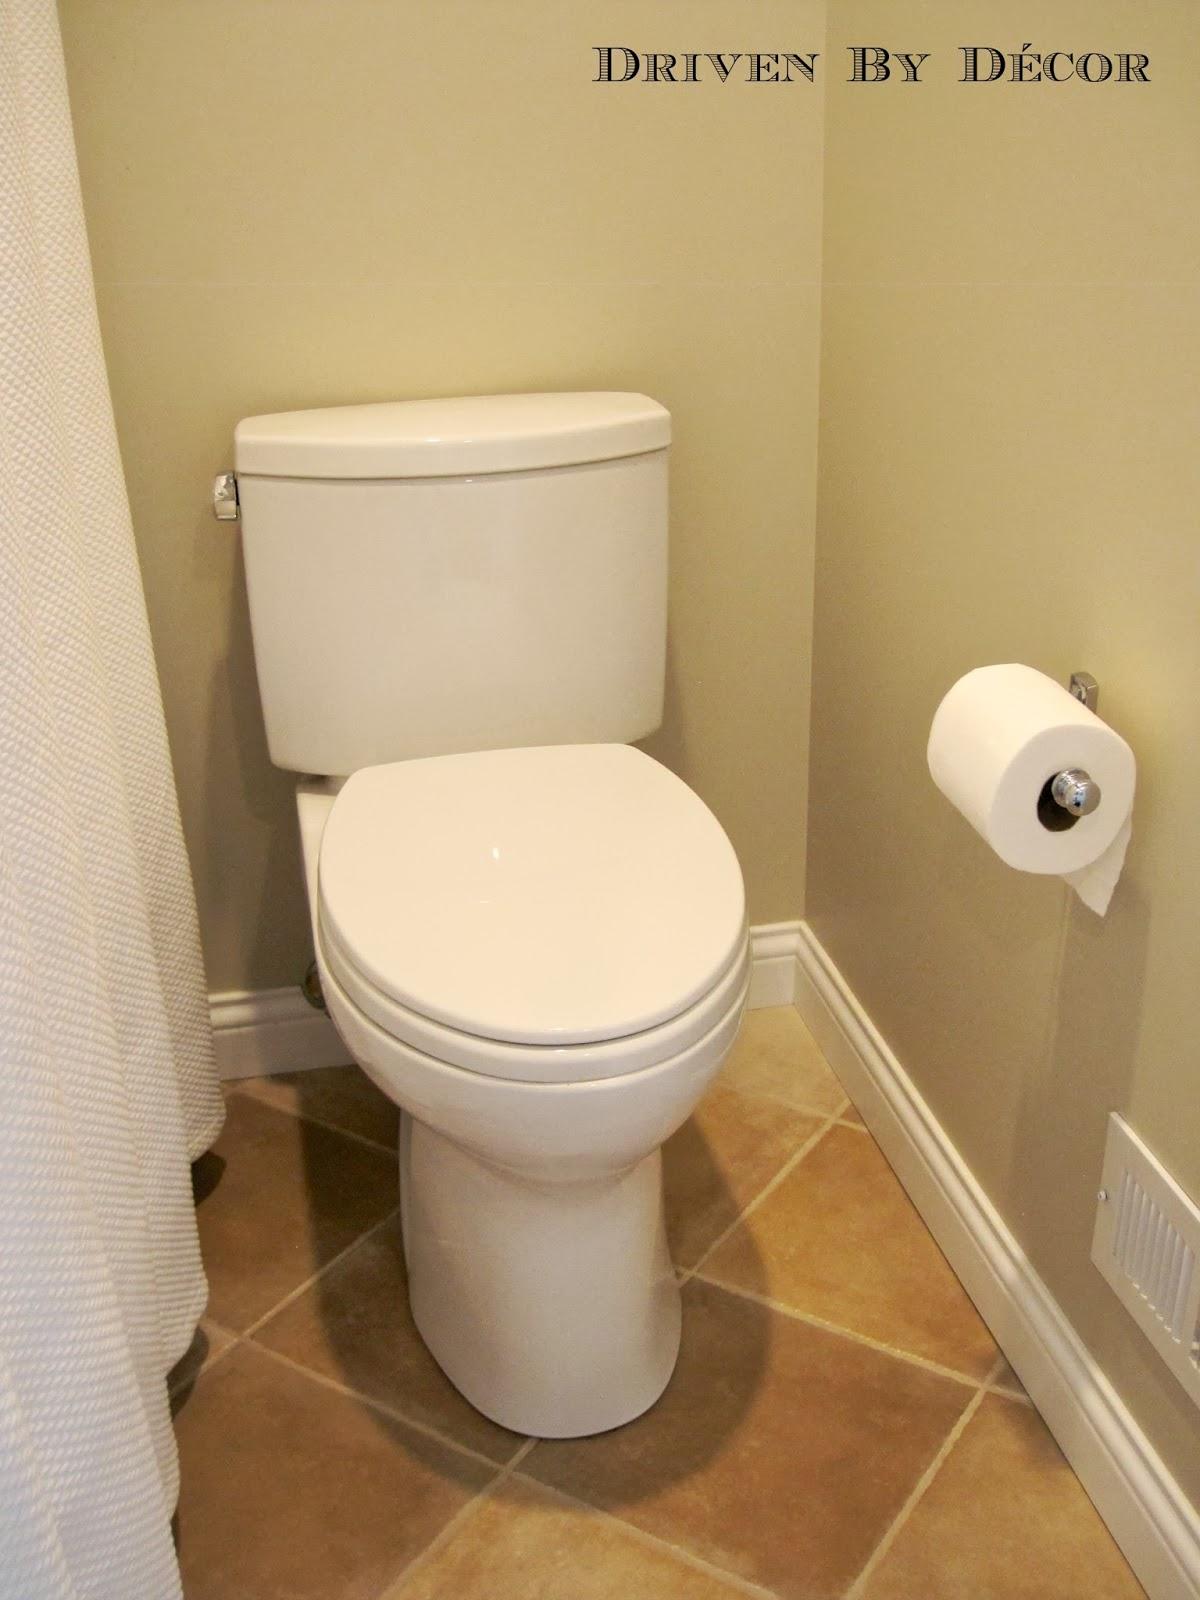 House Tour Girls Bathroom Driven By Decor